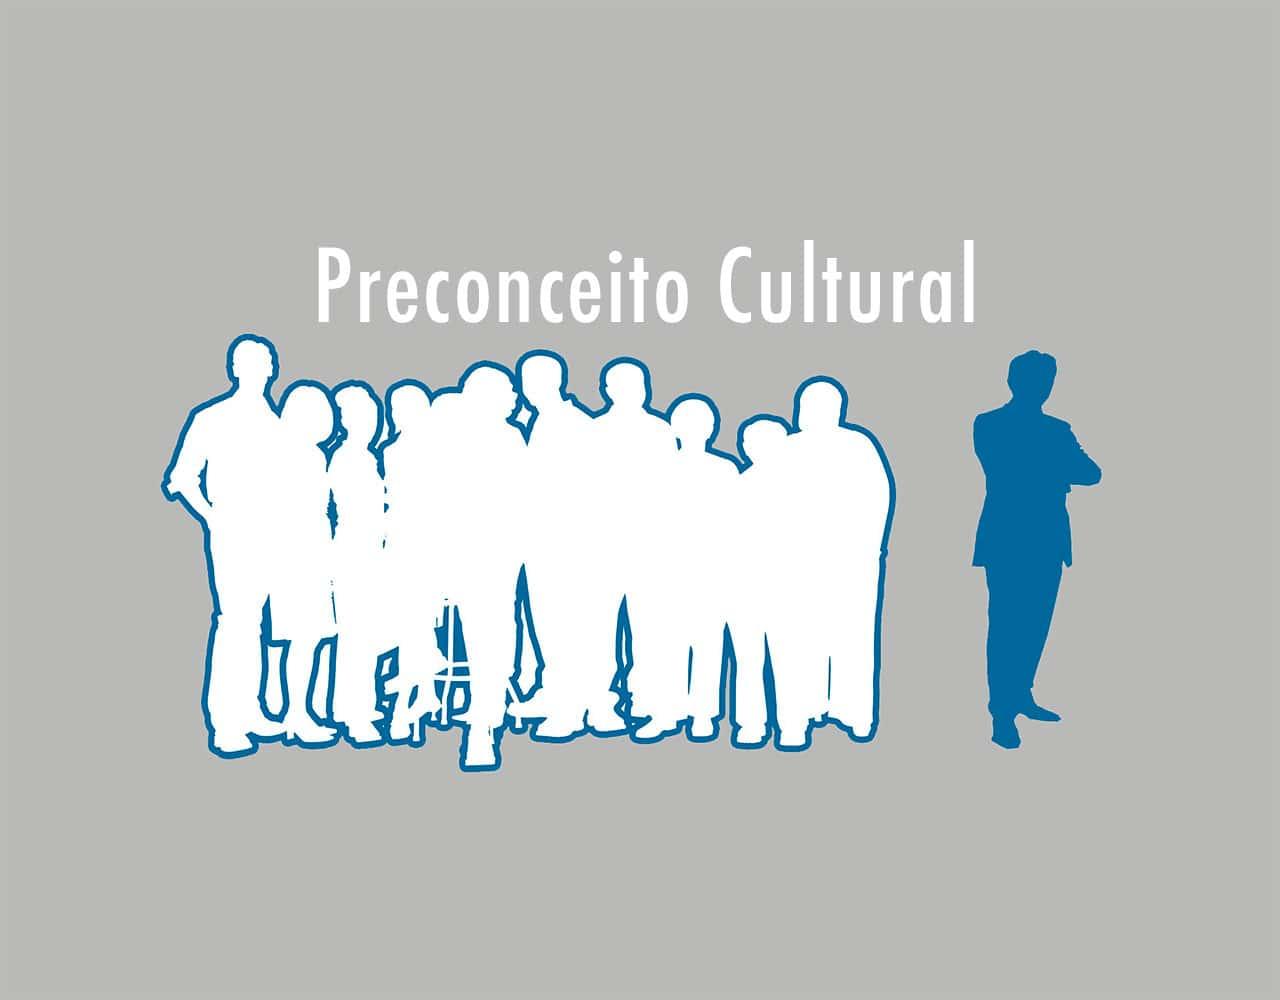 Preconceito Cultural